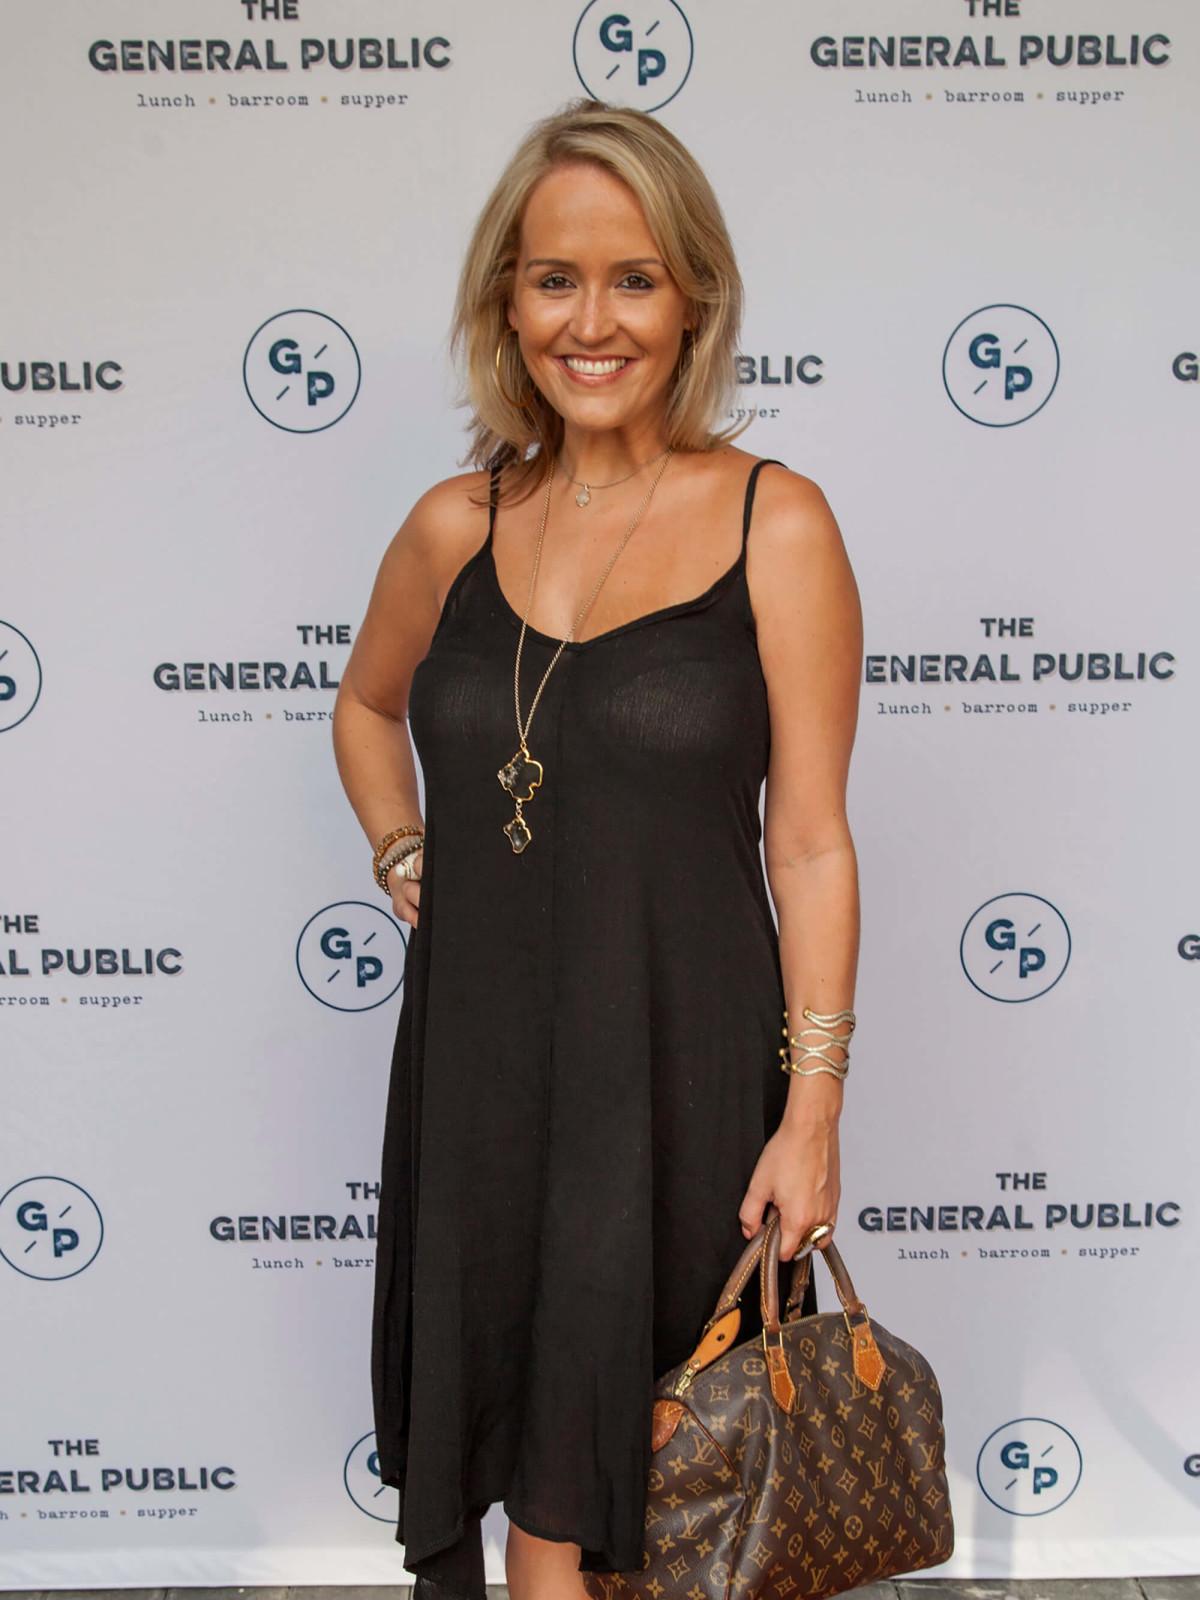 The General Public opening, 8/16, Nicole Fertitta